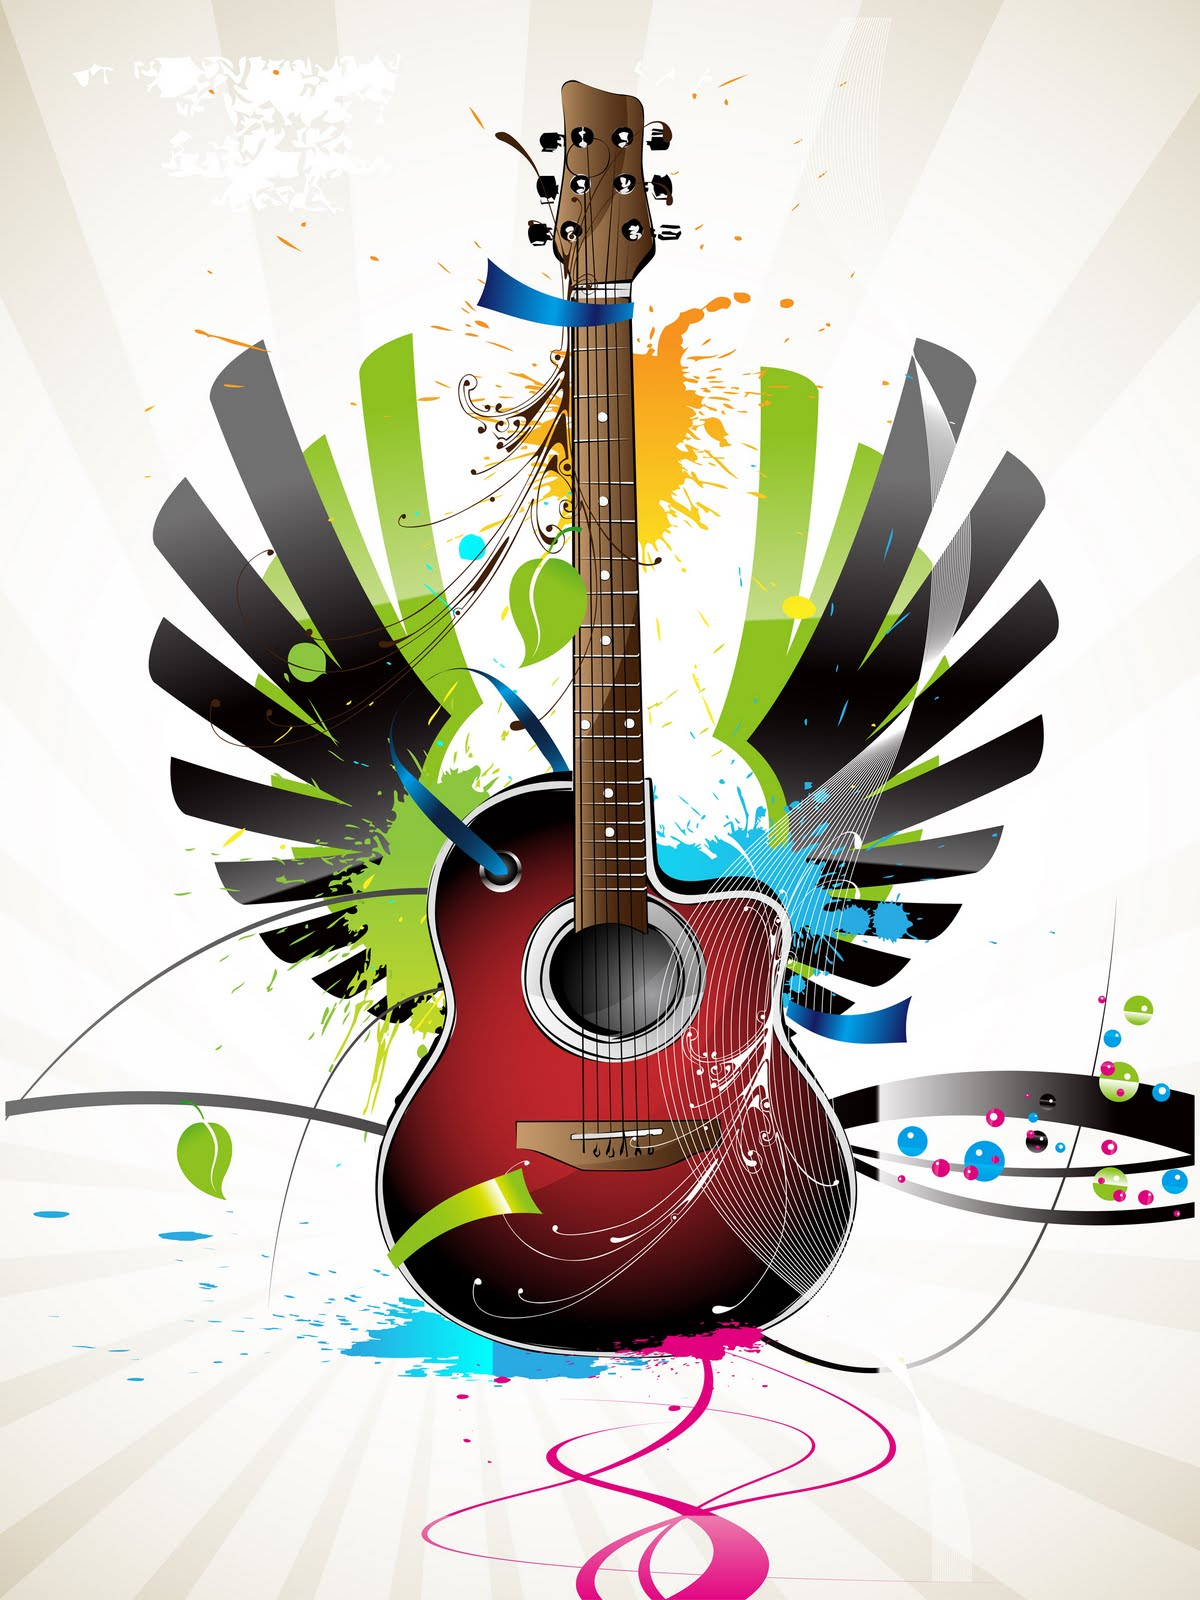 http://3.bp.blogspot.com/-urj7I-8yRsY/UCK8rikH2xI/AAAAAAAAFfw/gPjp_GSY0Xg/s1600/musical-+3.jpg